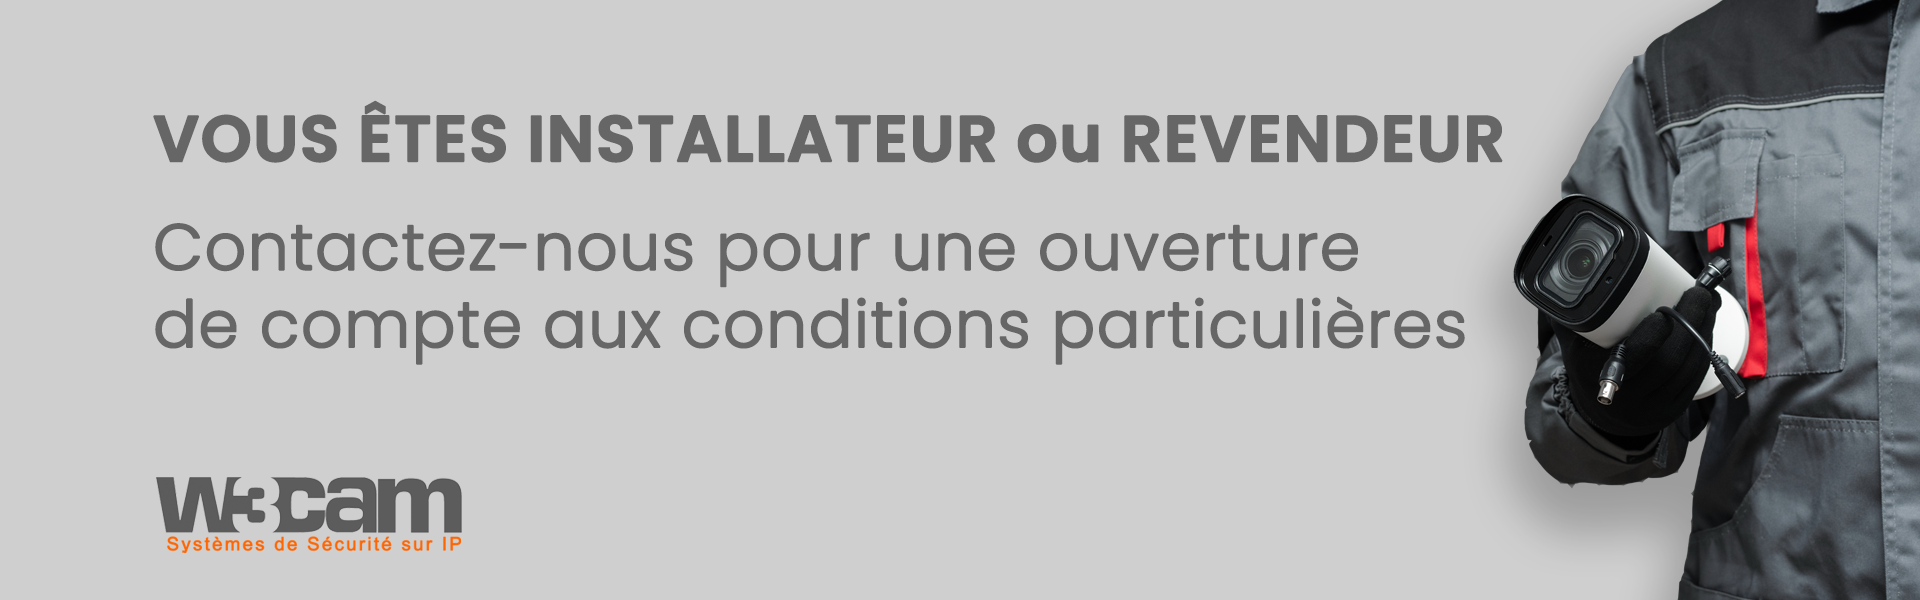 Revendeur/Installateur